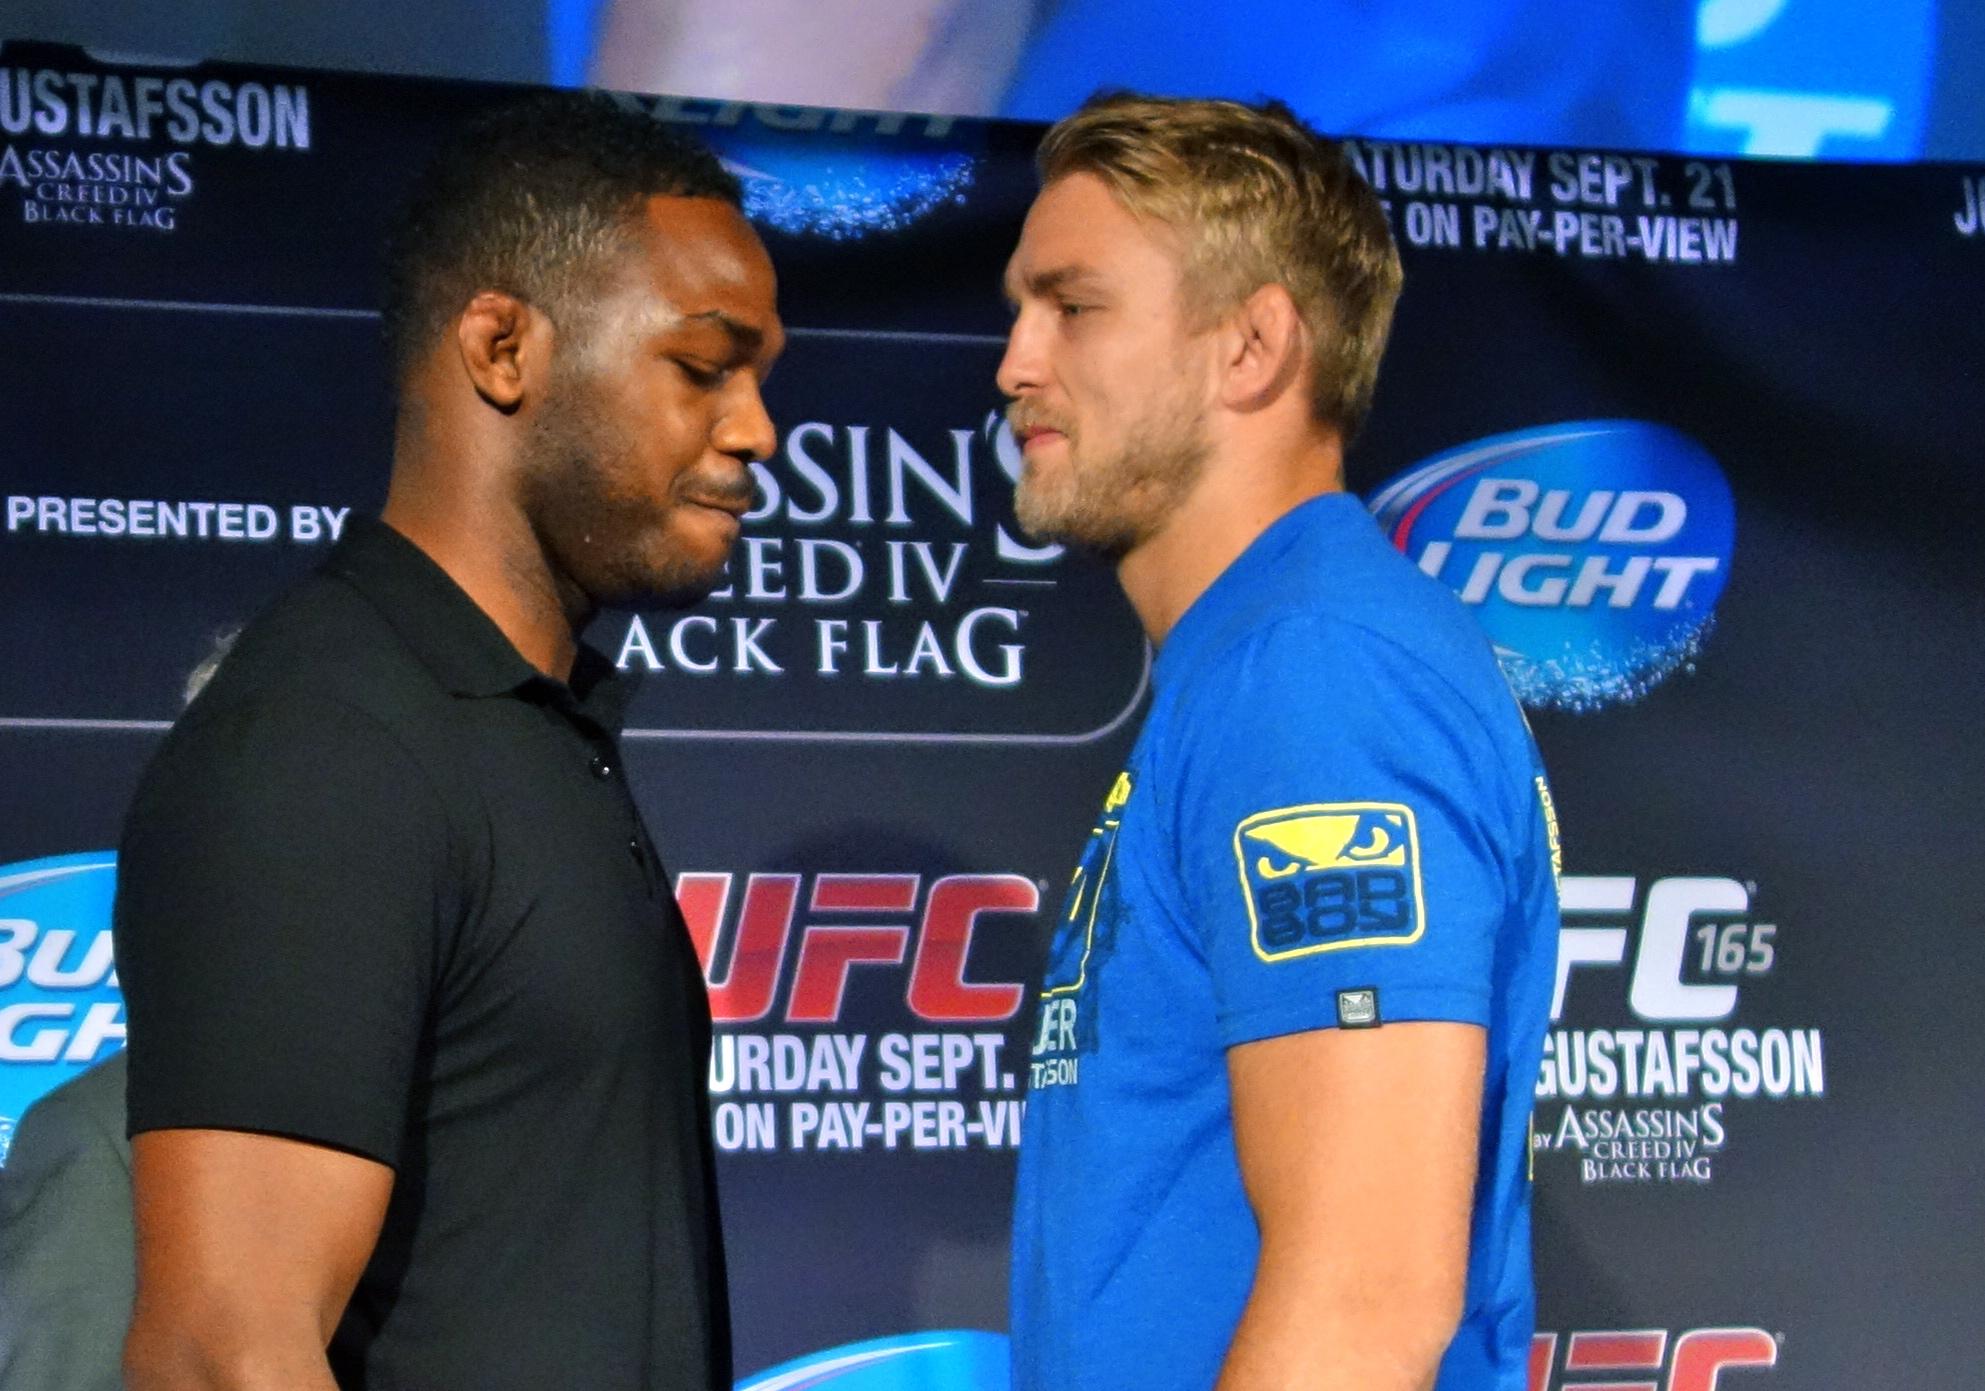 UFC 165: Jones vs. Gustafsson